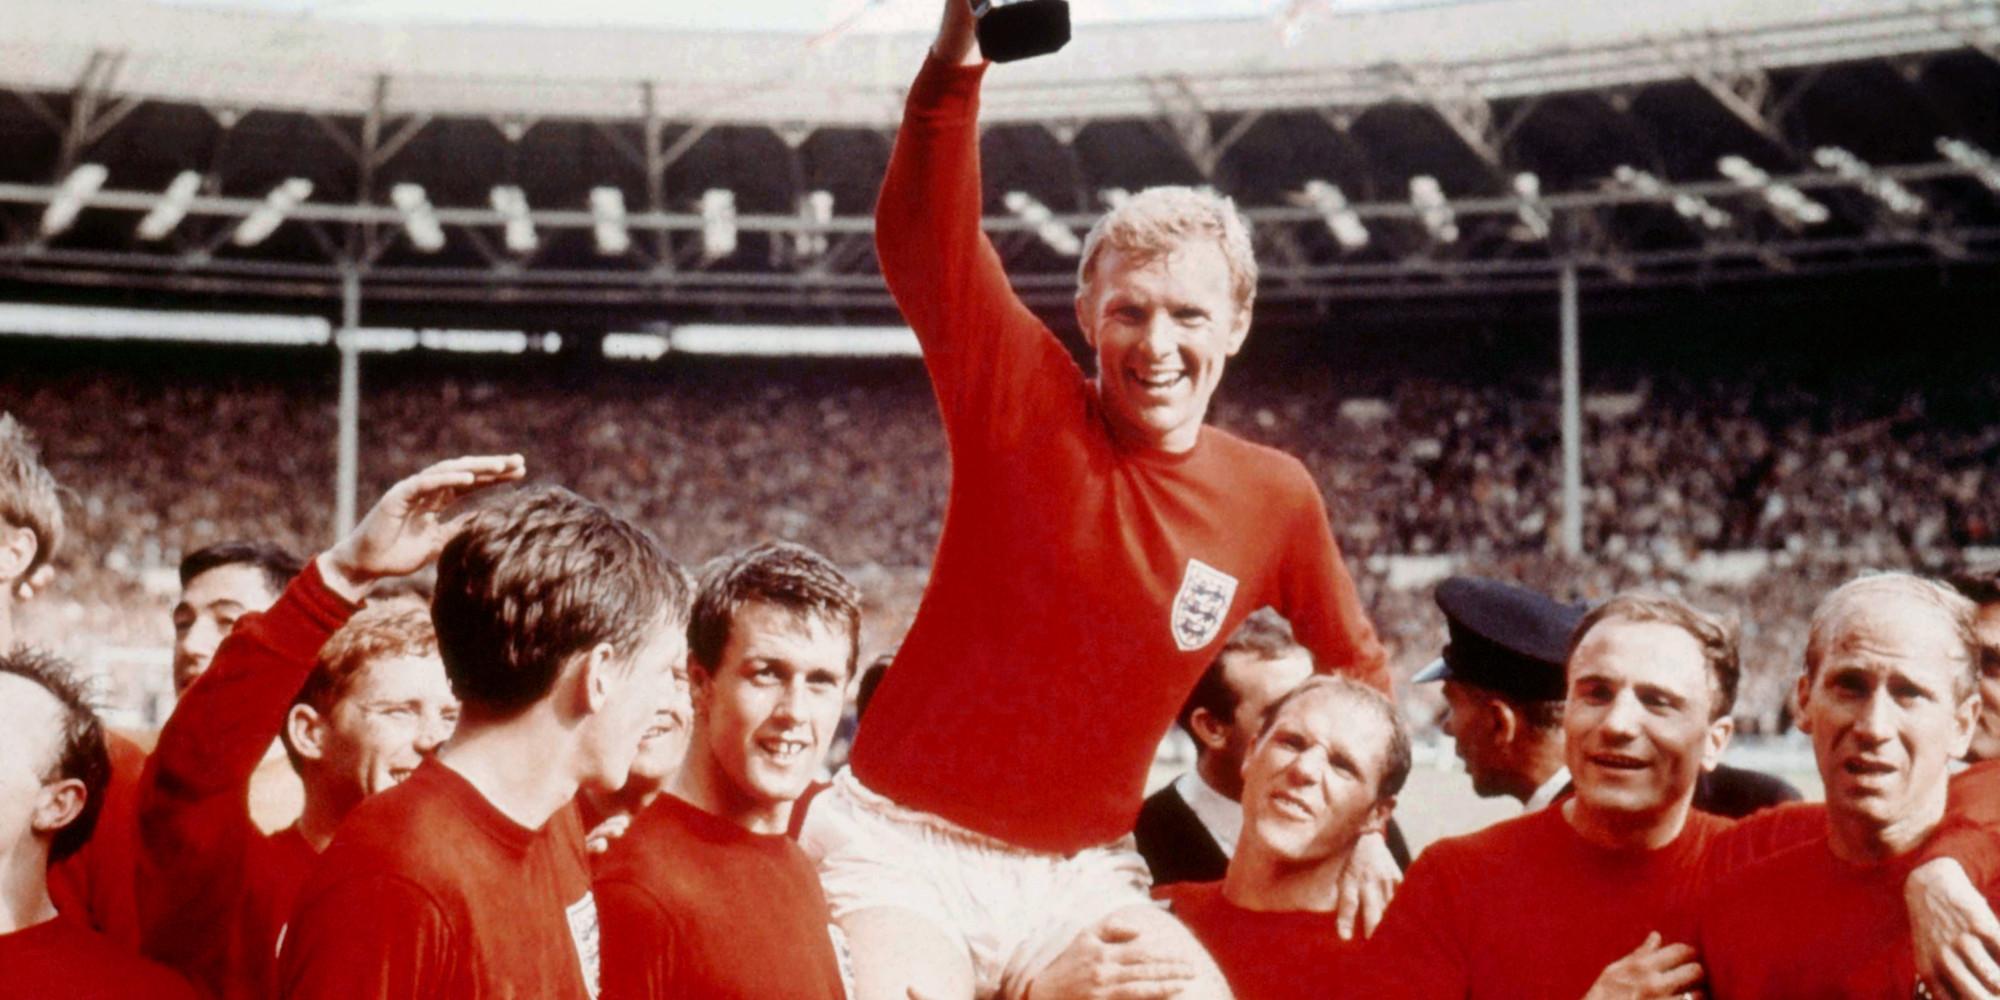 Soccer - FIFA World Cup England 66 - Final - England v West Germany - Wembley Stadium